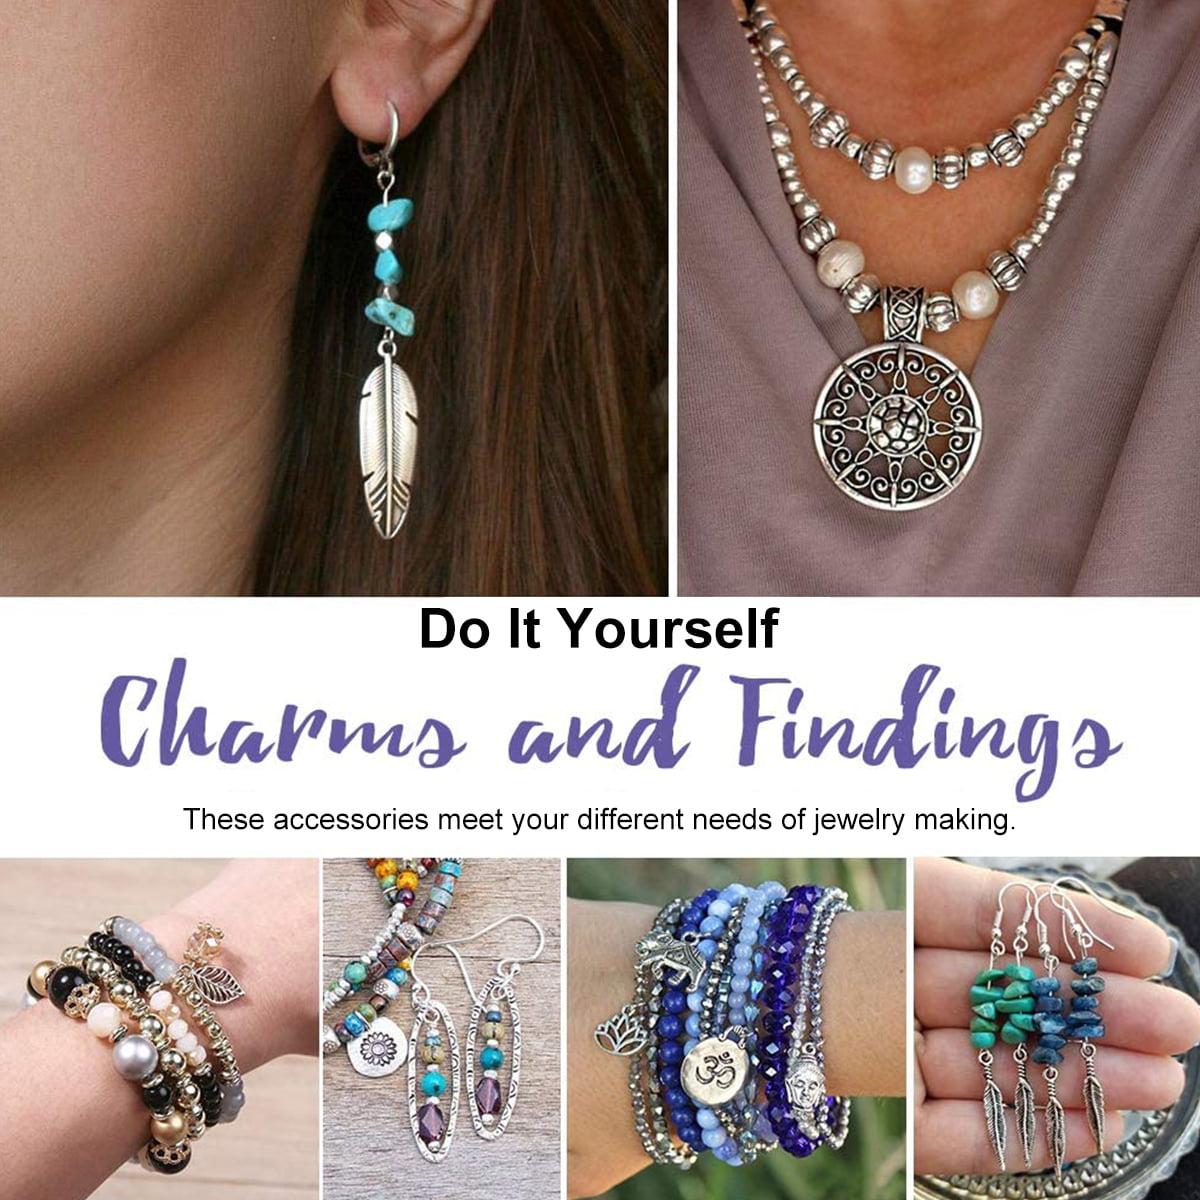 DIY Jewelry Supply Free Northern Star Bracelet Tutorial by Nela K\u00e1belov\u00e1 Available Separately Do-It-Yourself Jewelry Bead Pack